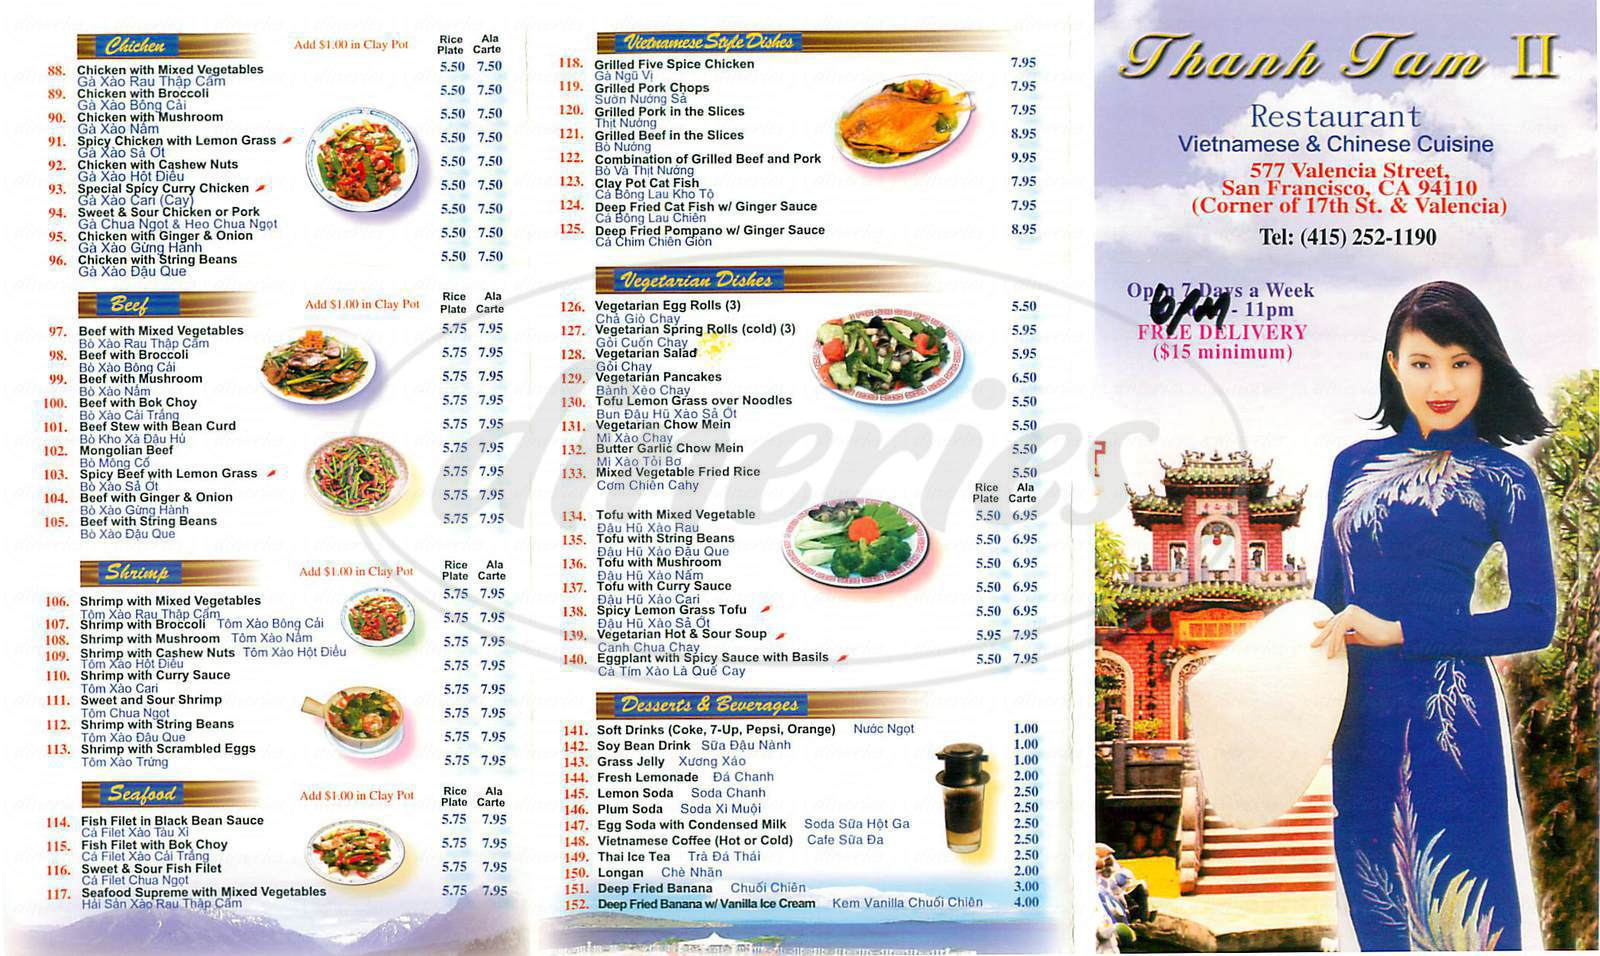 menu for Thanh Tam II Restaurant